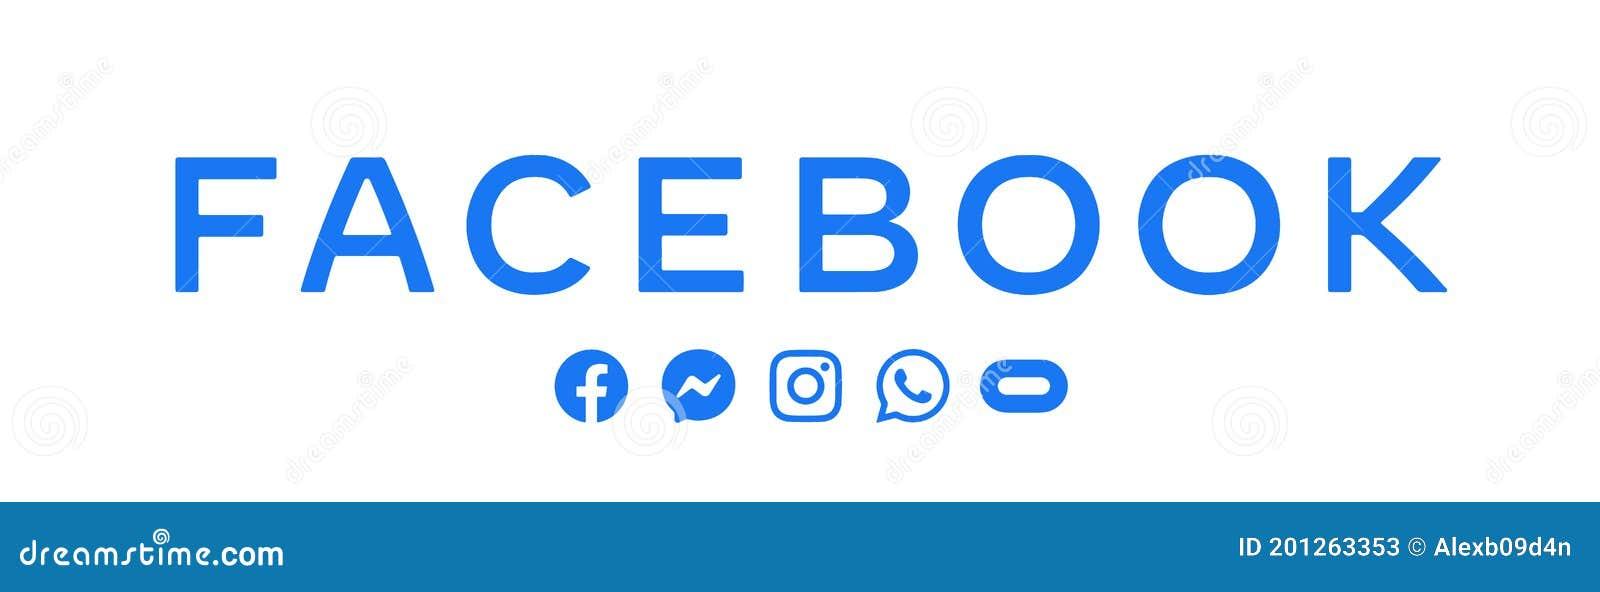 New Vector Logo Social Media Icon Facebook Messenger Instagram Whatsapp Oculus Editorial Stock Photo Illustration Of Logos Website 201263353